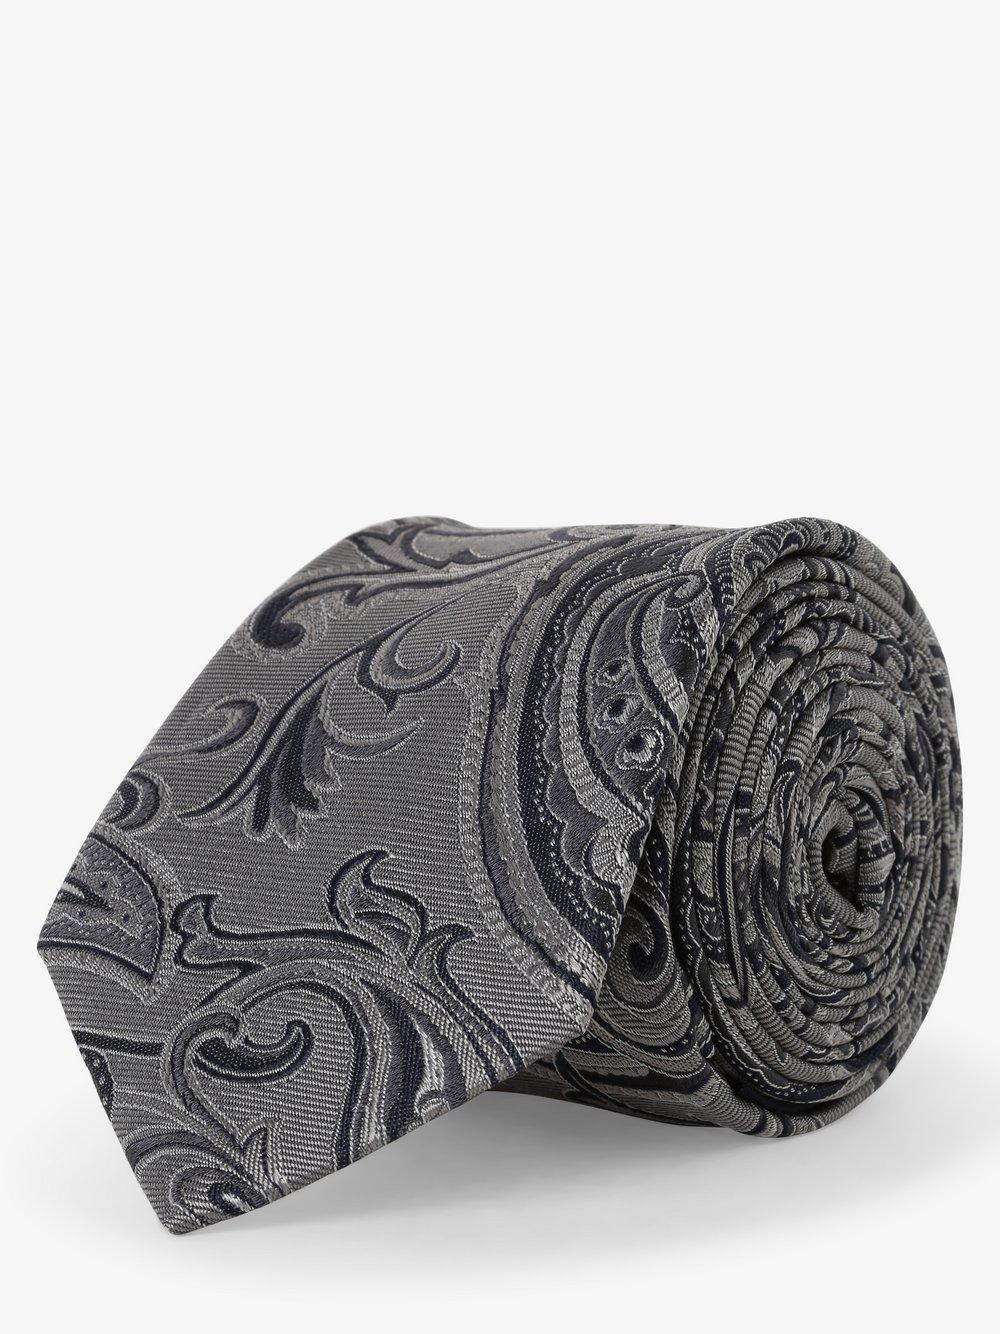 Andrew James – Krawat jedwabny męski, szary Van Graaf 490925-0001-00000